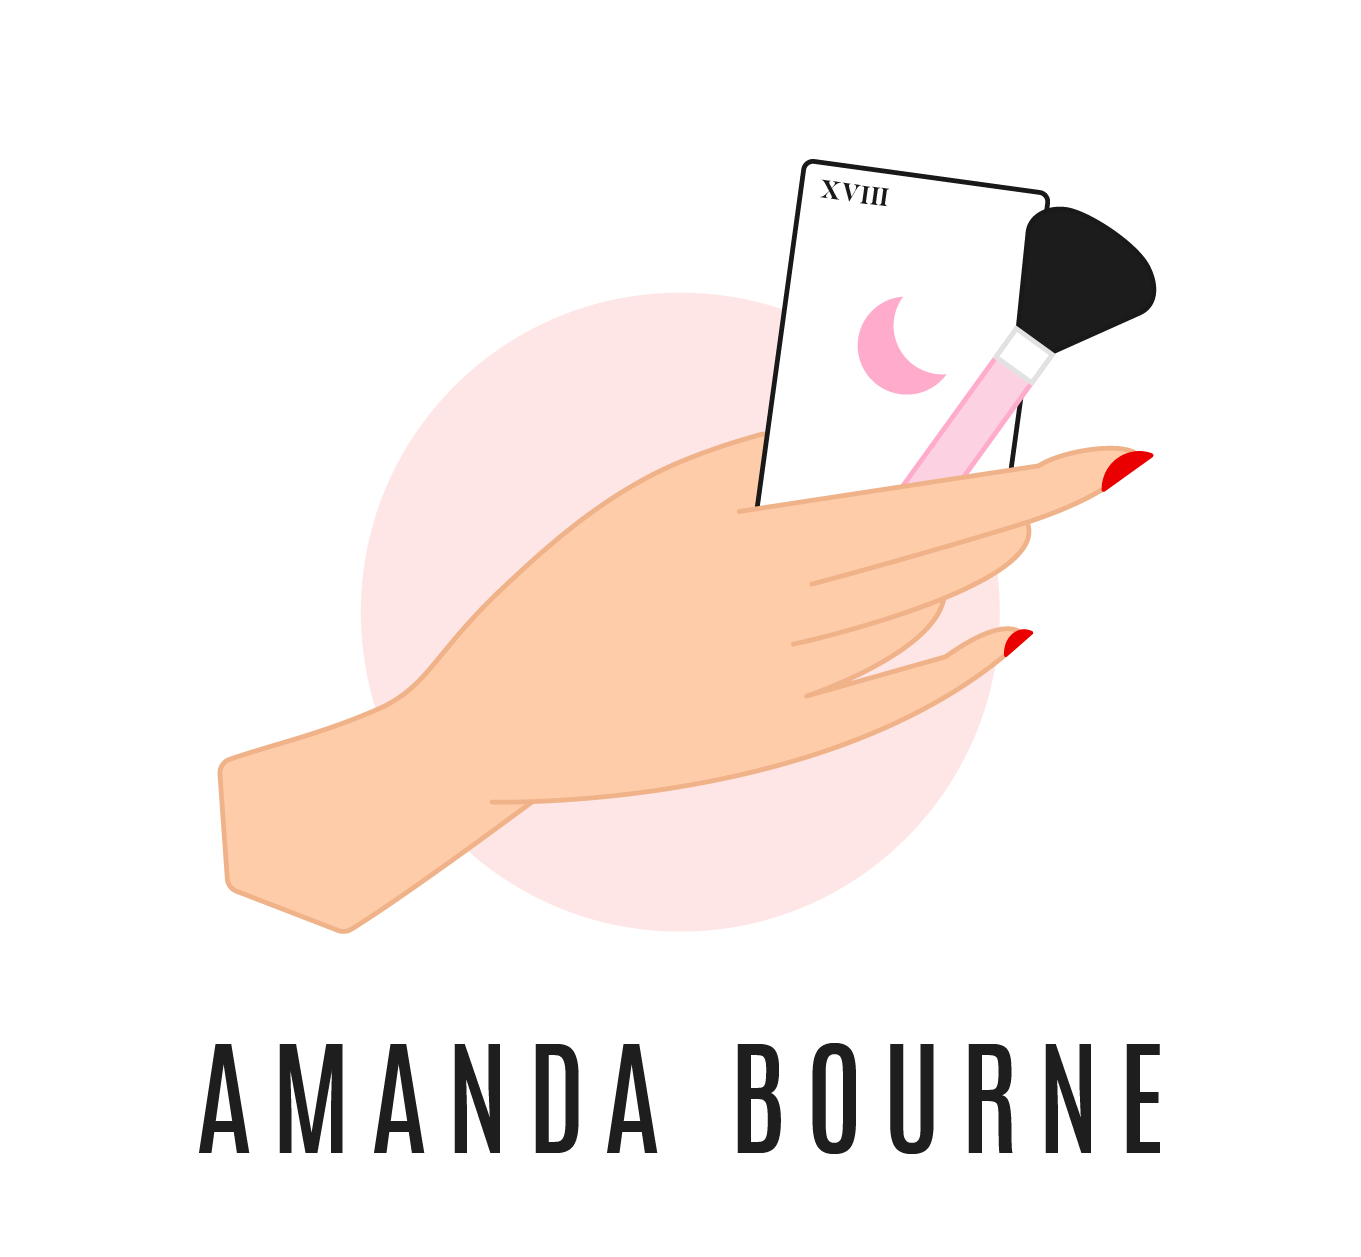 amanda bourne_R2_web copy.png